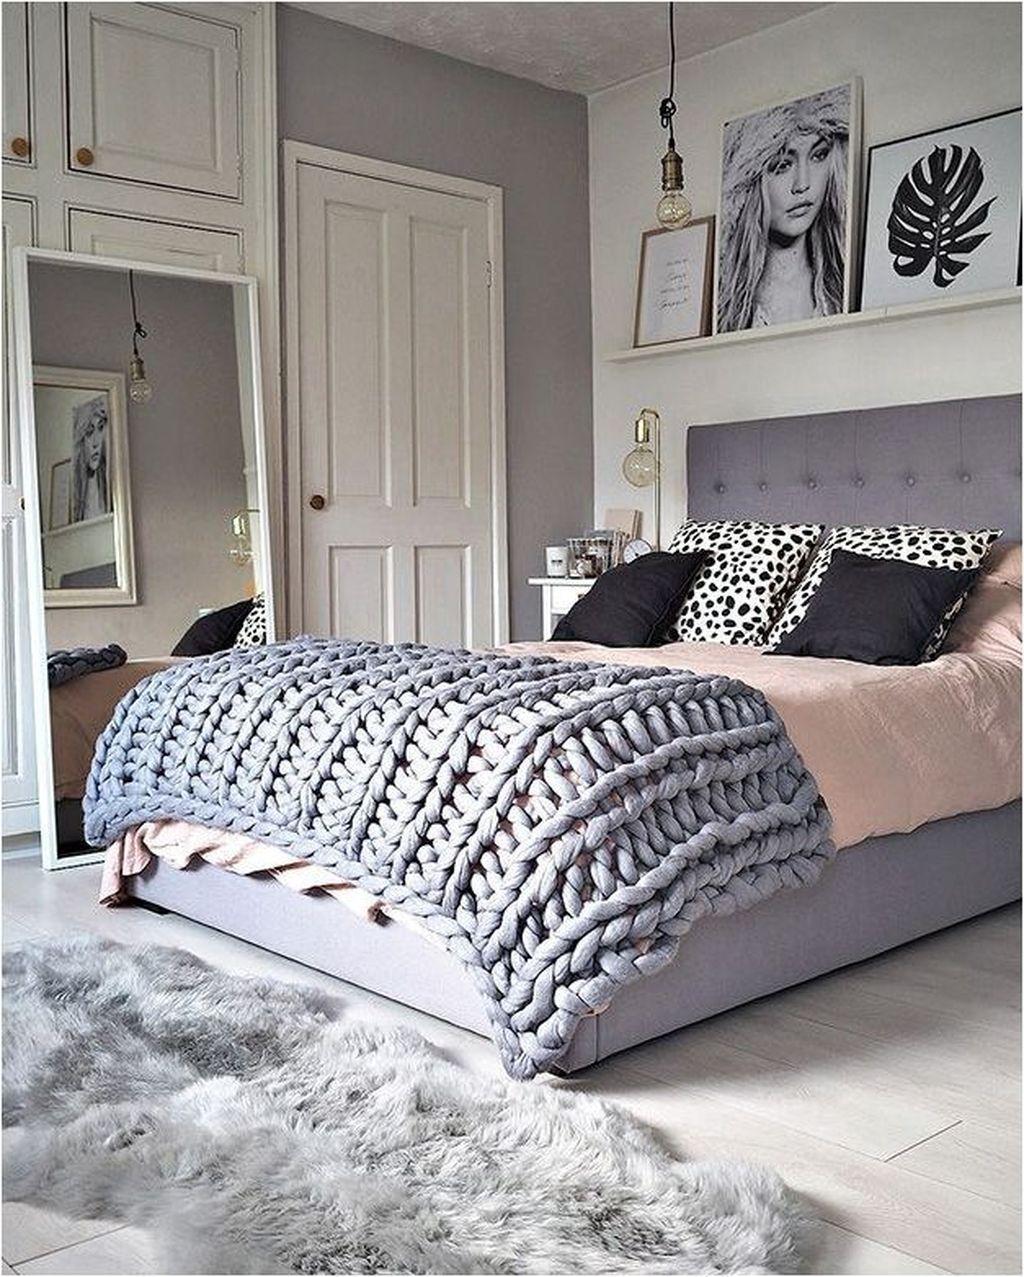 Sweet Bedroom Ideas: 36 Sweet Bedroom Decor Ideas For Teen